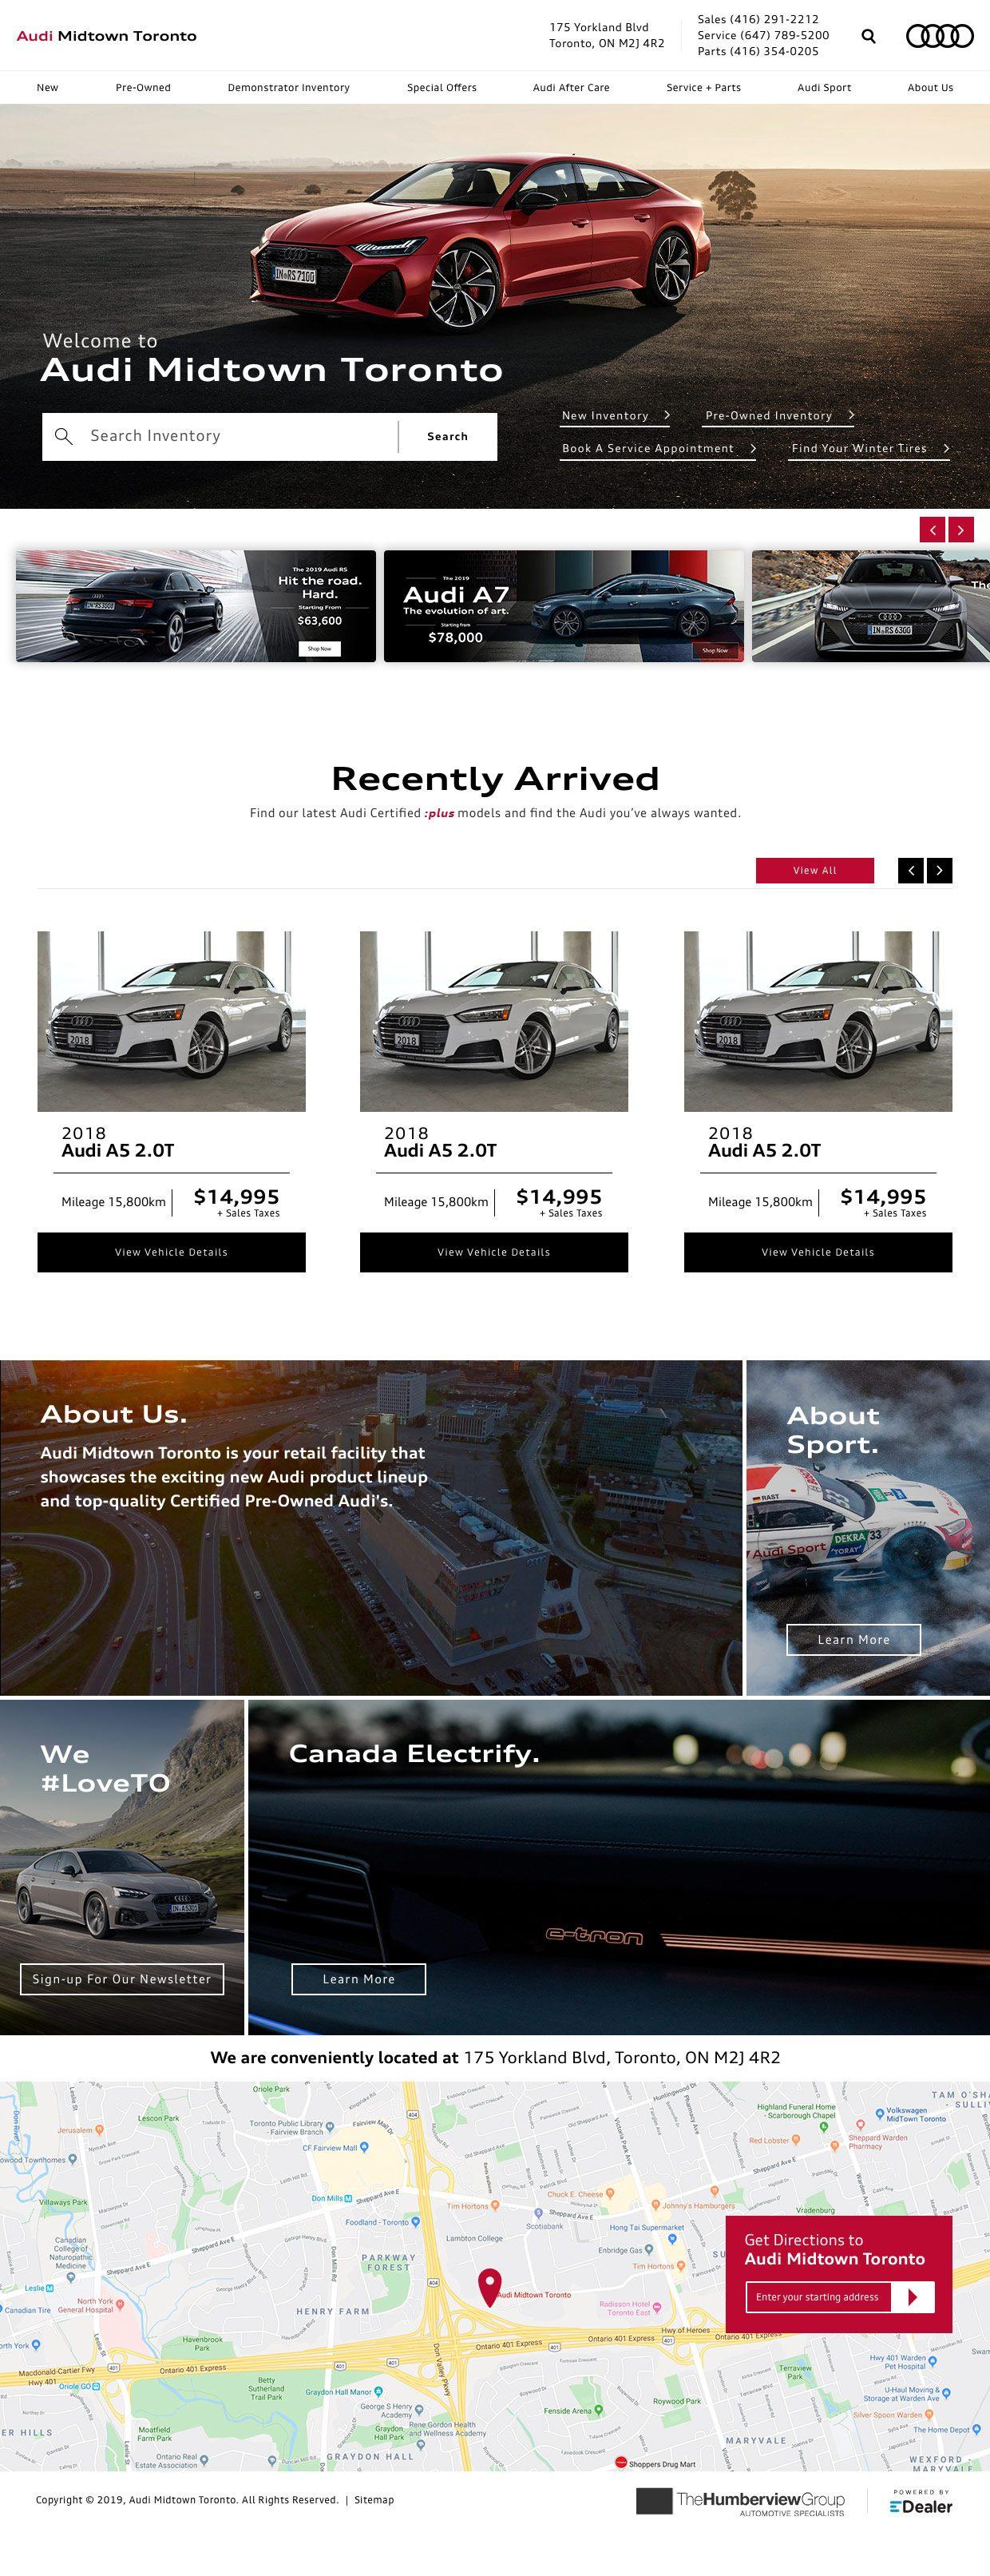 Audi Midtown Toronto